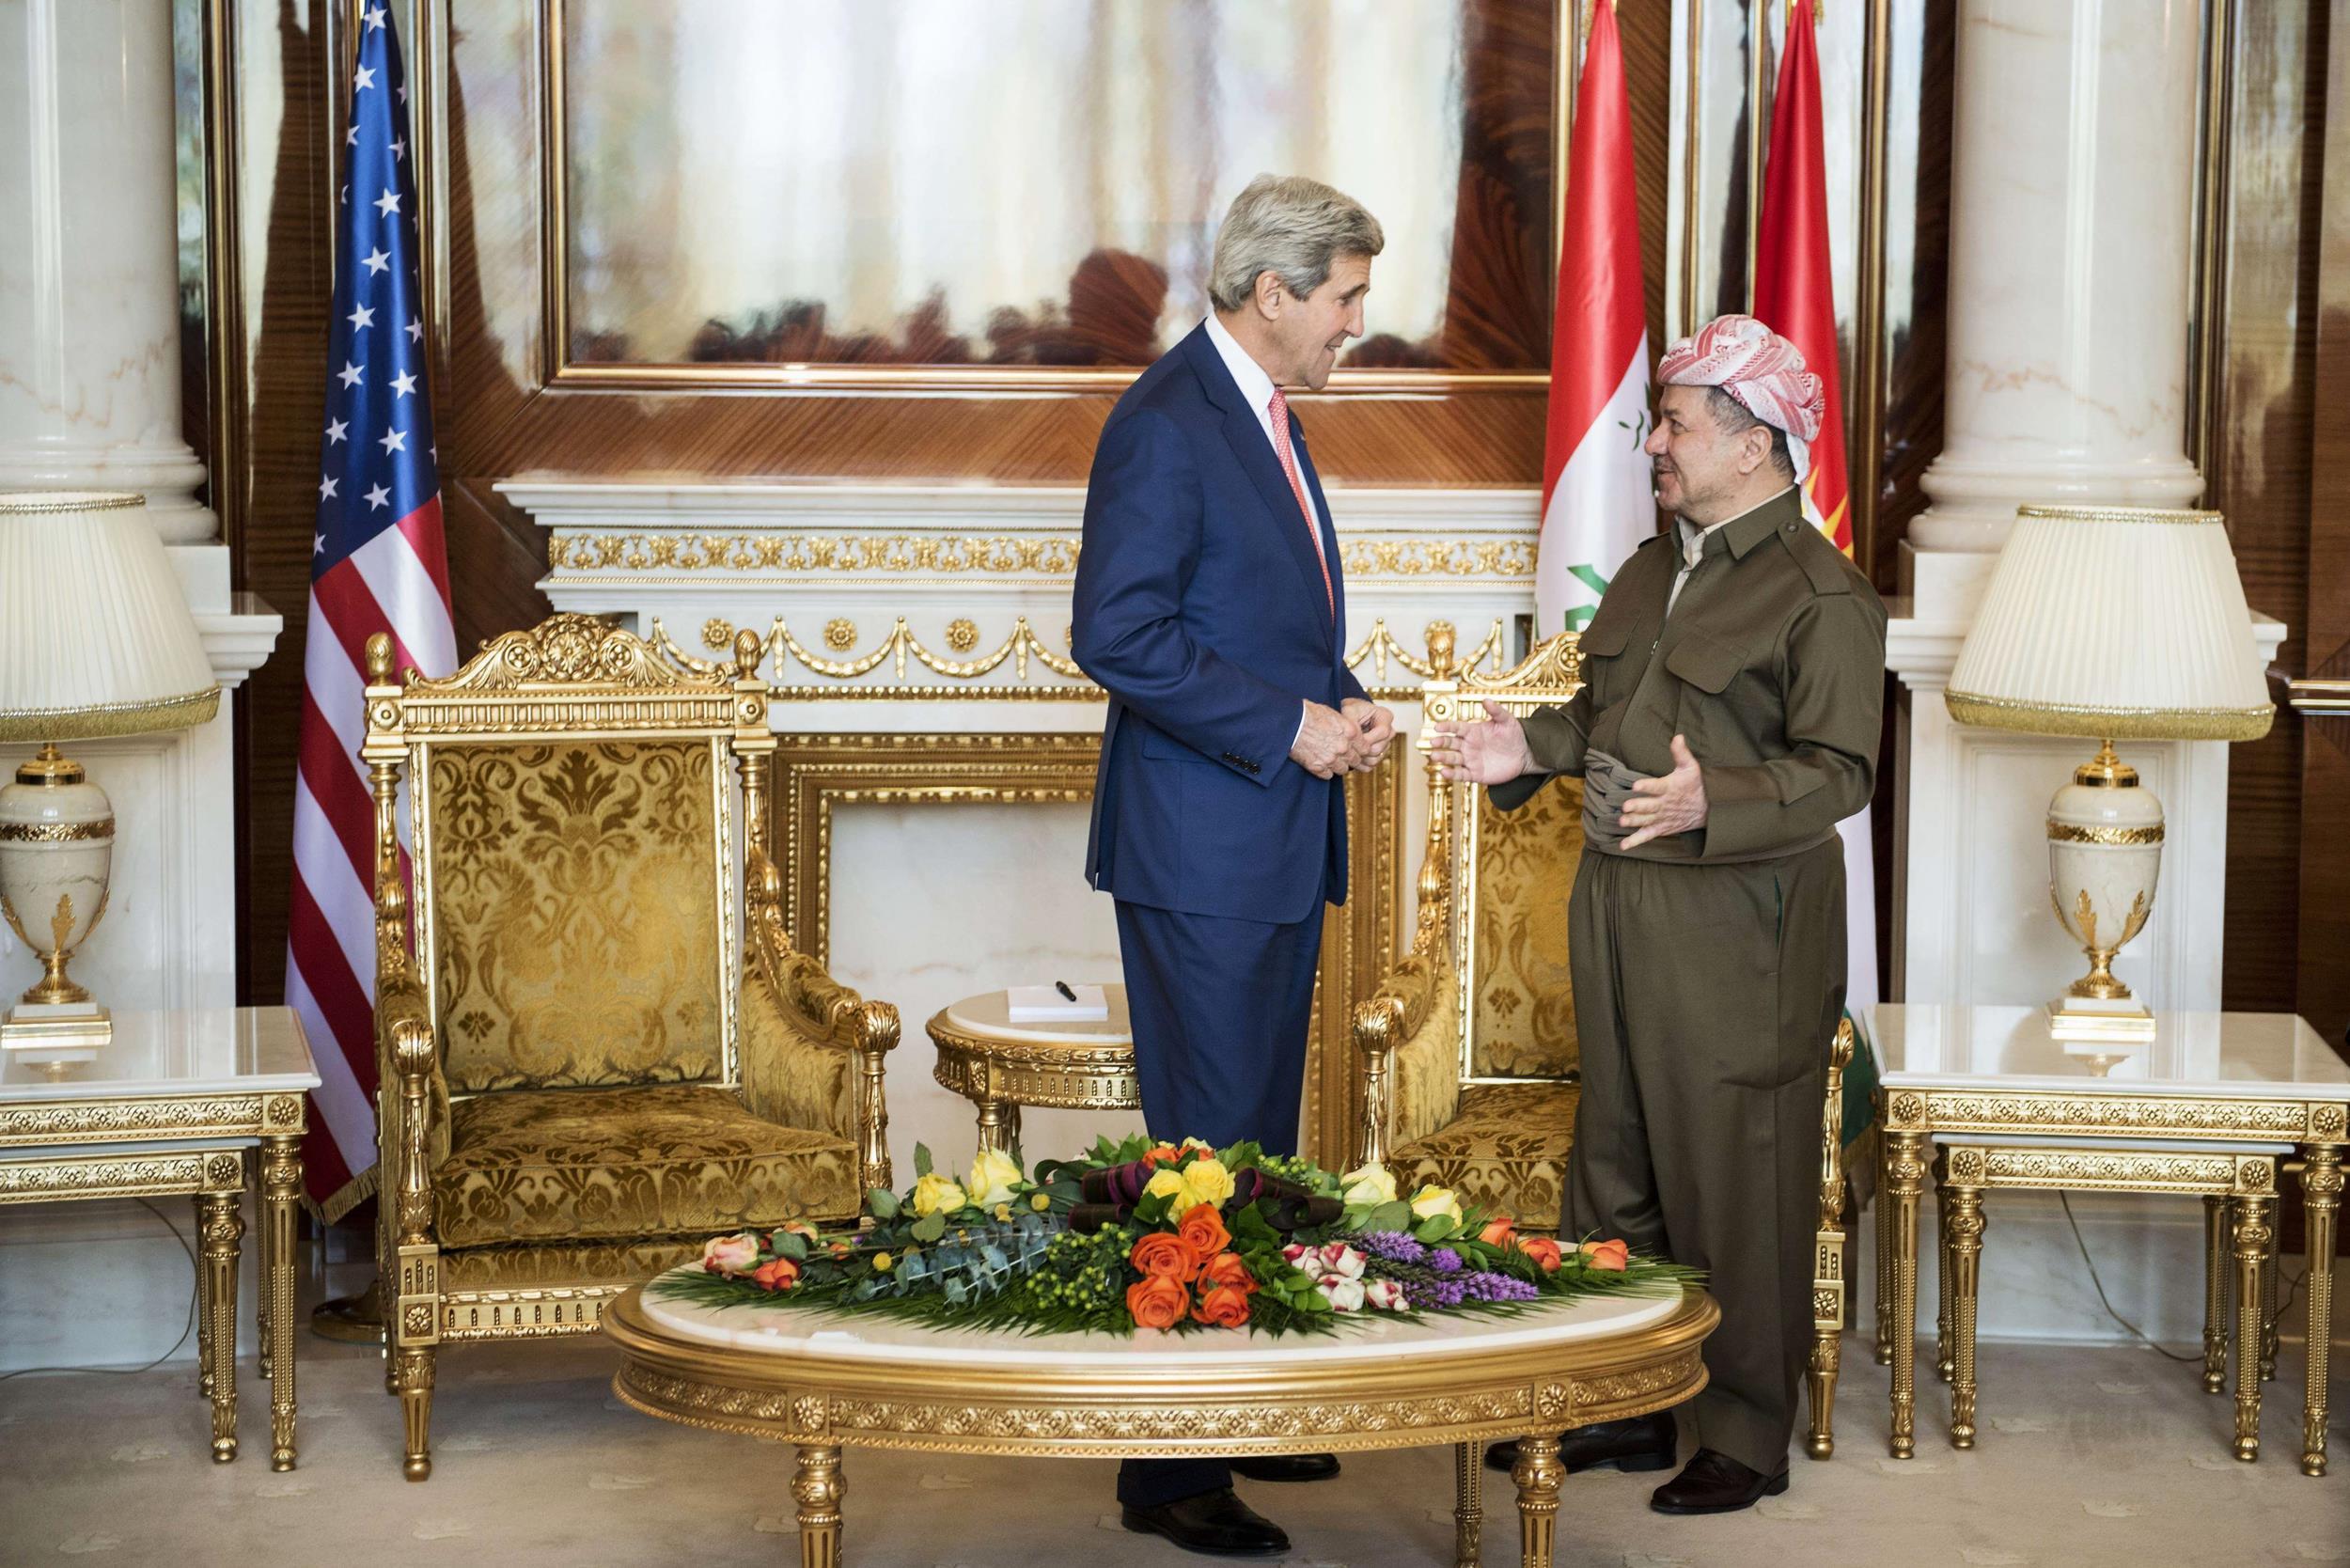 Image: Kurdistan Regional Government President Massud Barzani (R) and US Secretary of State John Kerry